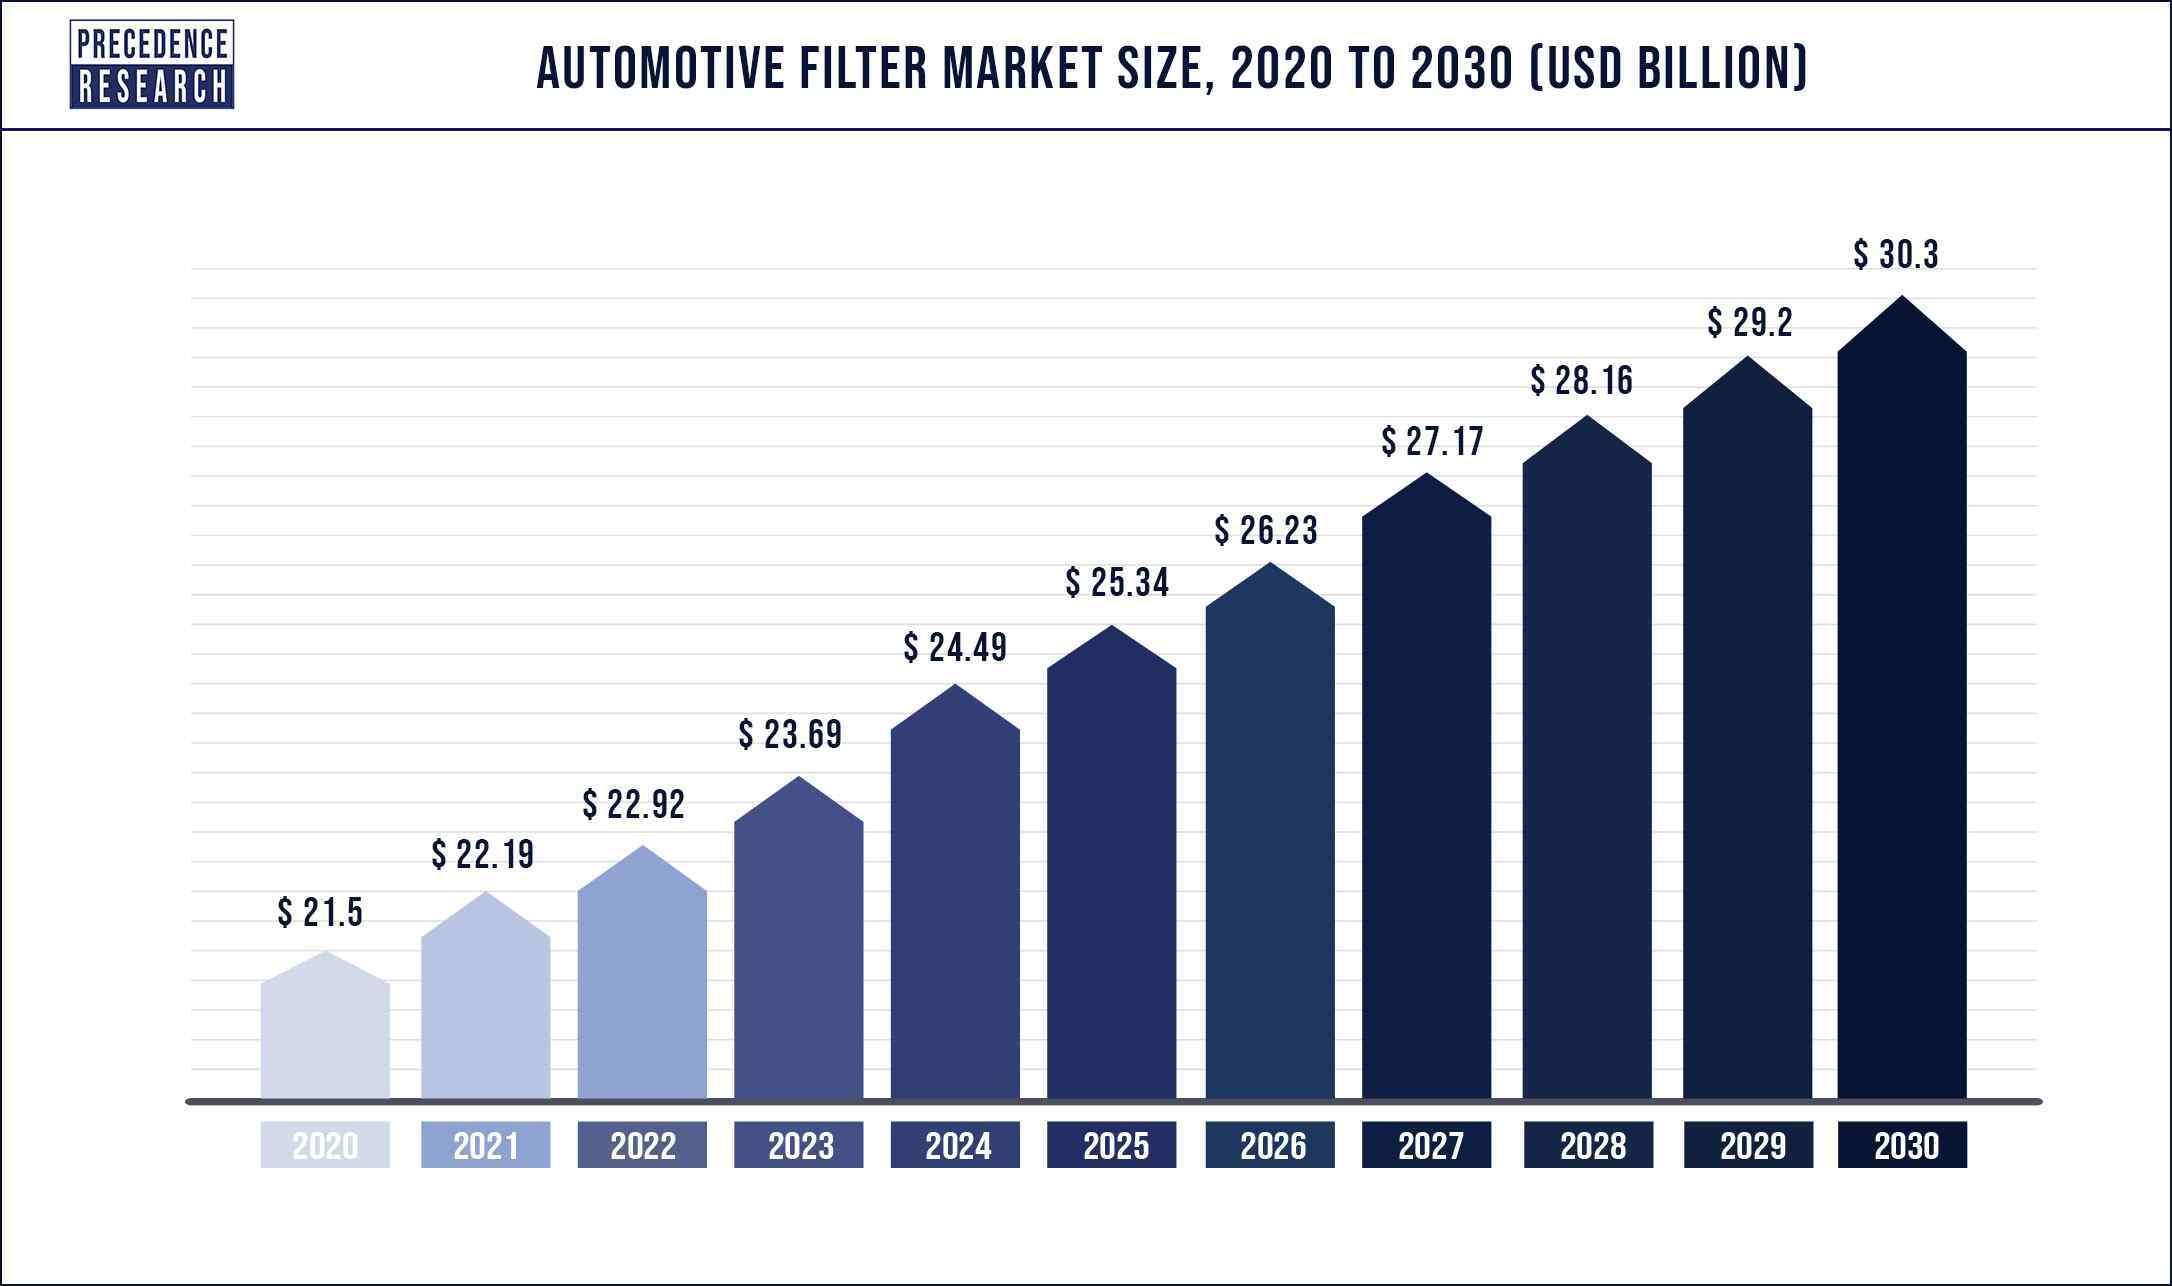 Automotive Filter Market Size 2020 to 2030